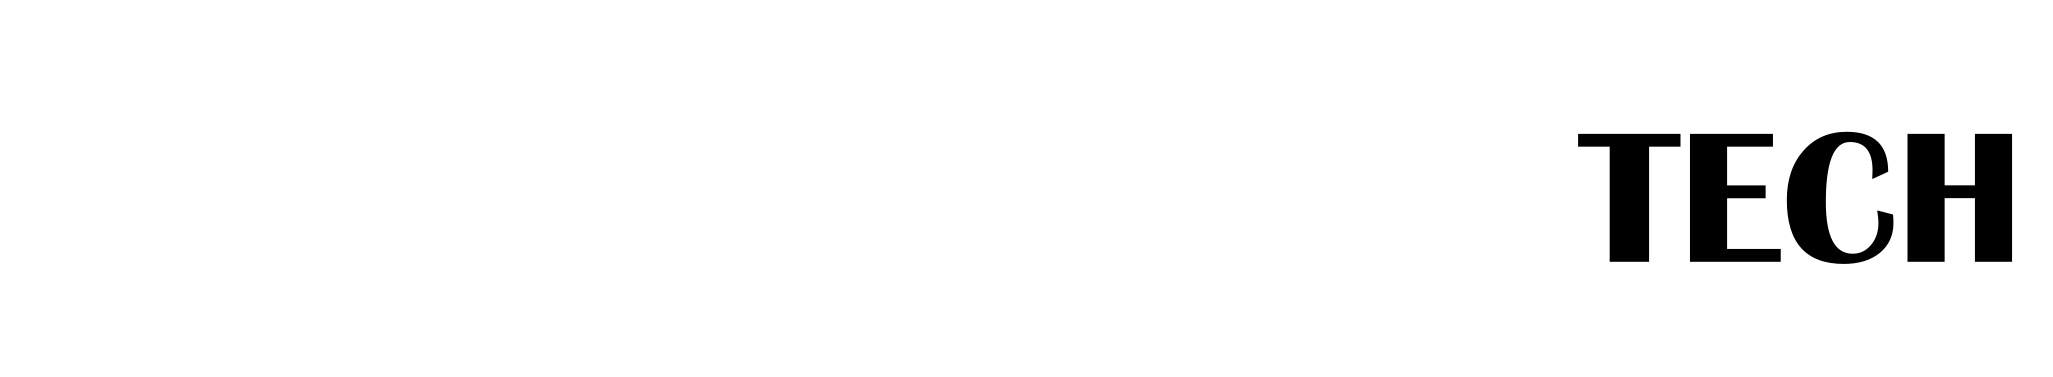 DaakyeTech